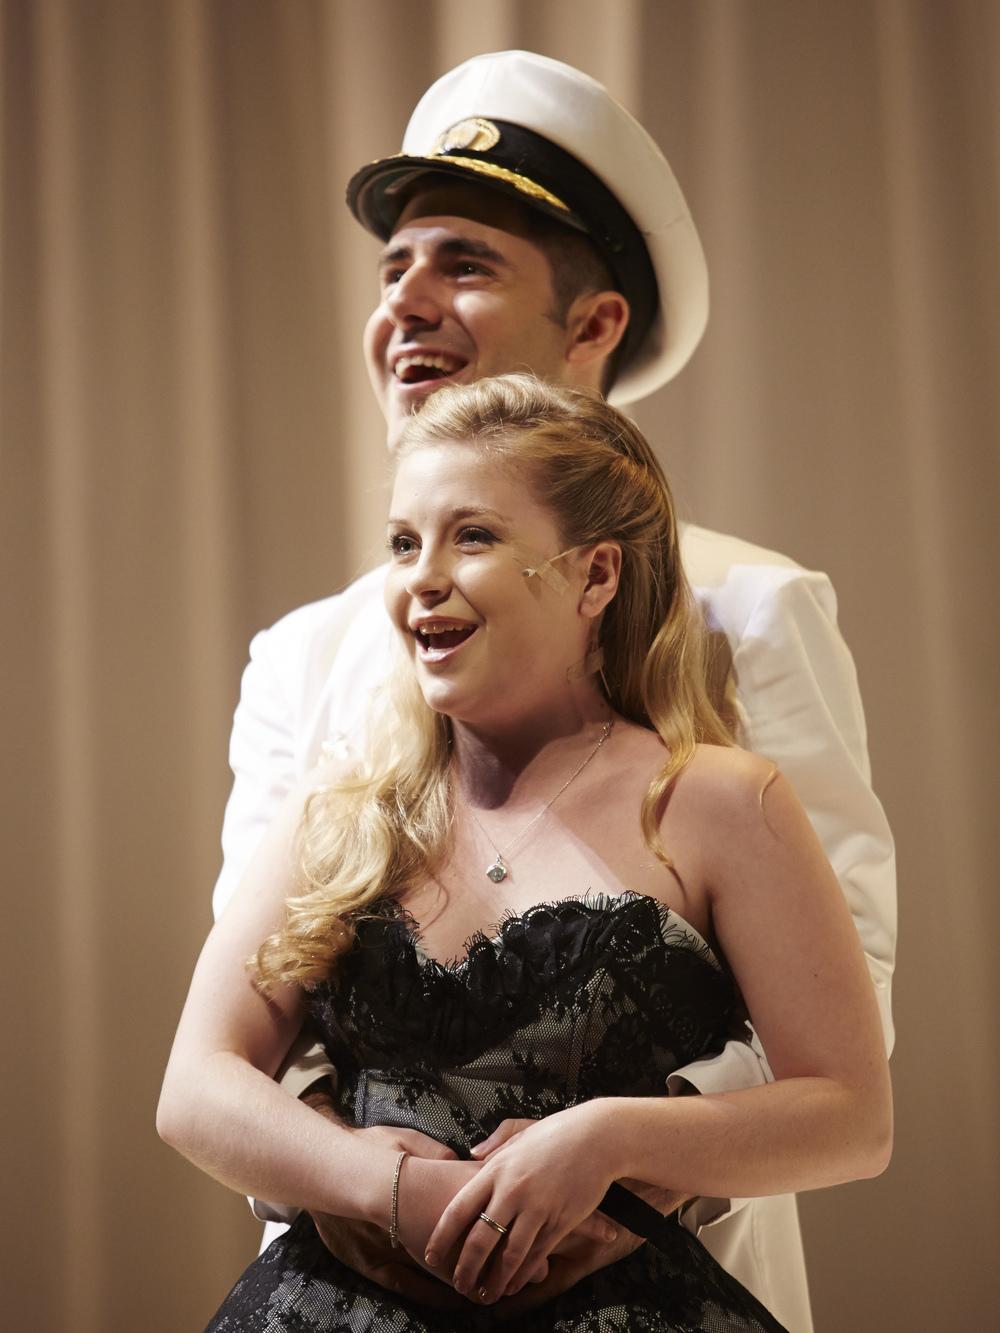 Pinchgut Giasone 2013_9995_Nicholas Dinopoulos as Ercole,Alexandra Oomens as Alinda_credit Keith Saunders.jpg